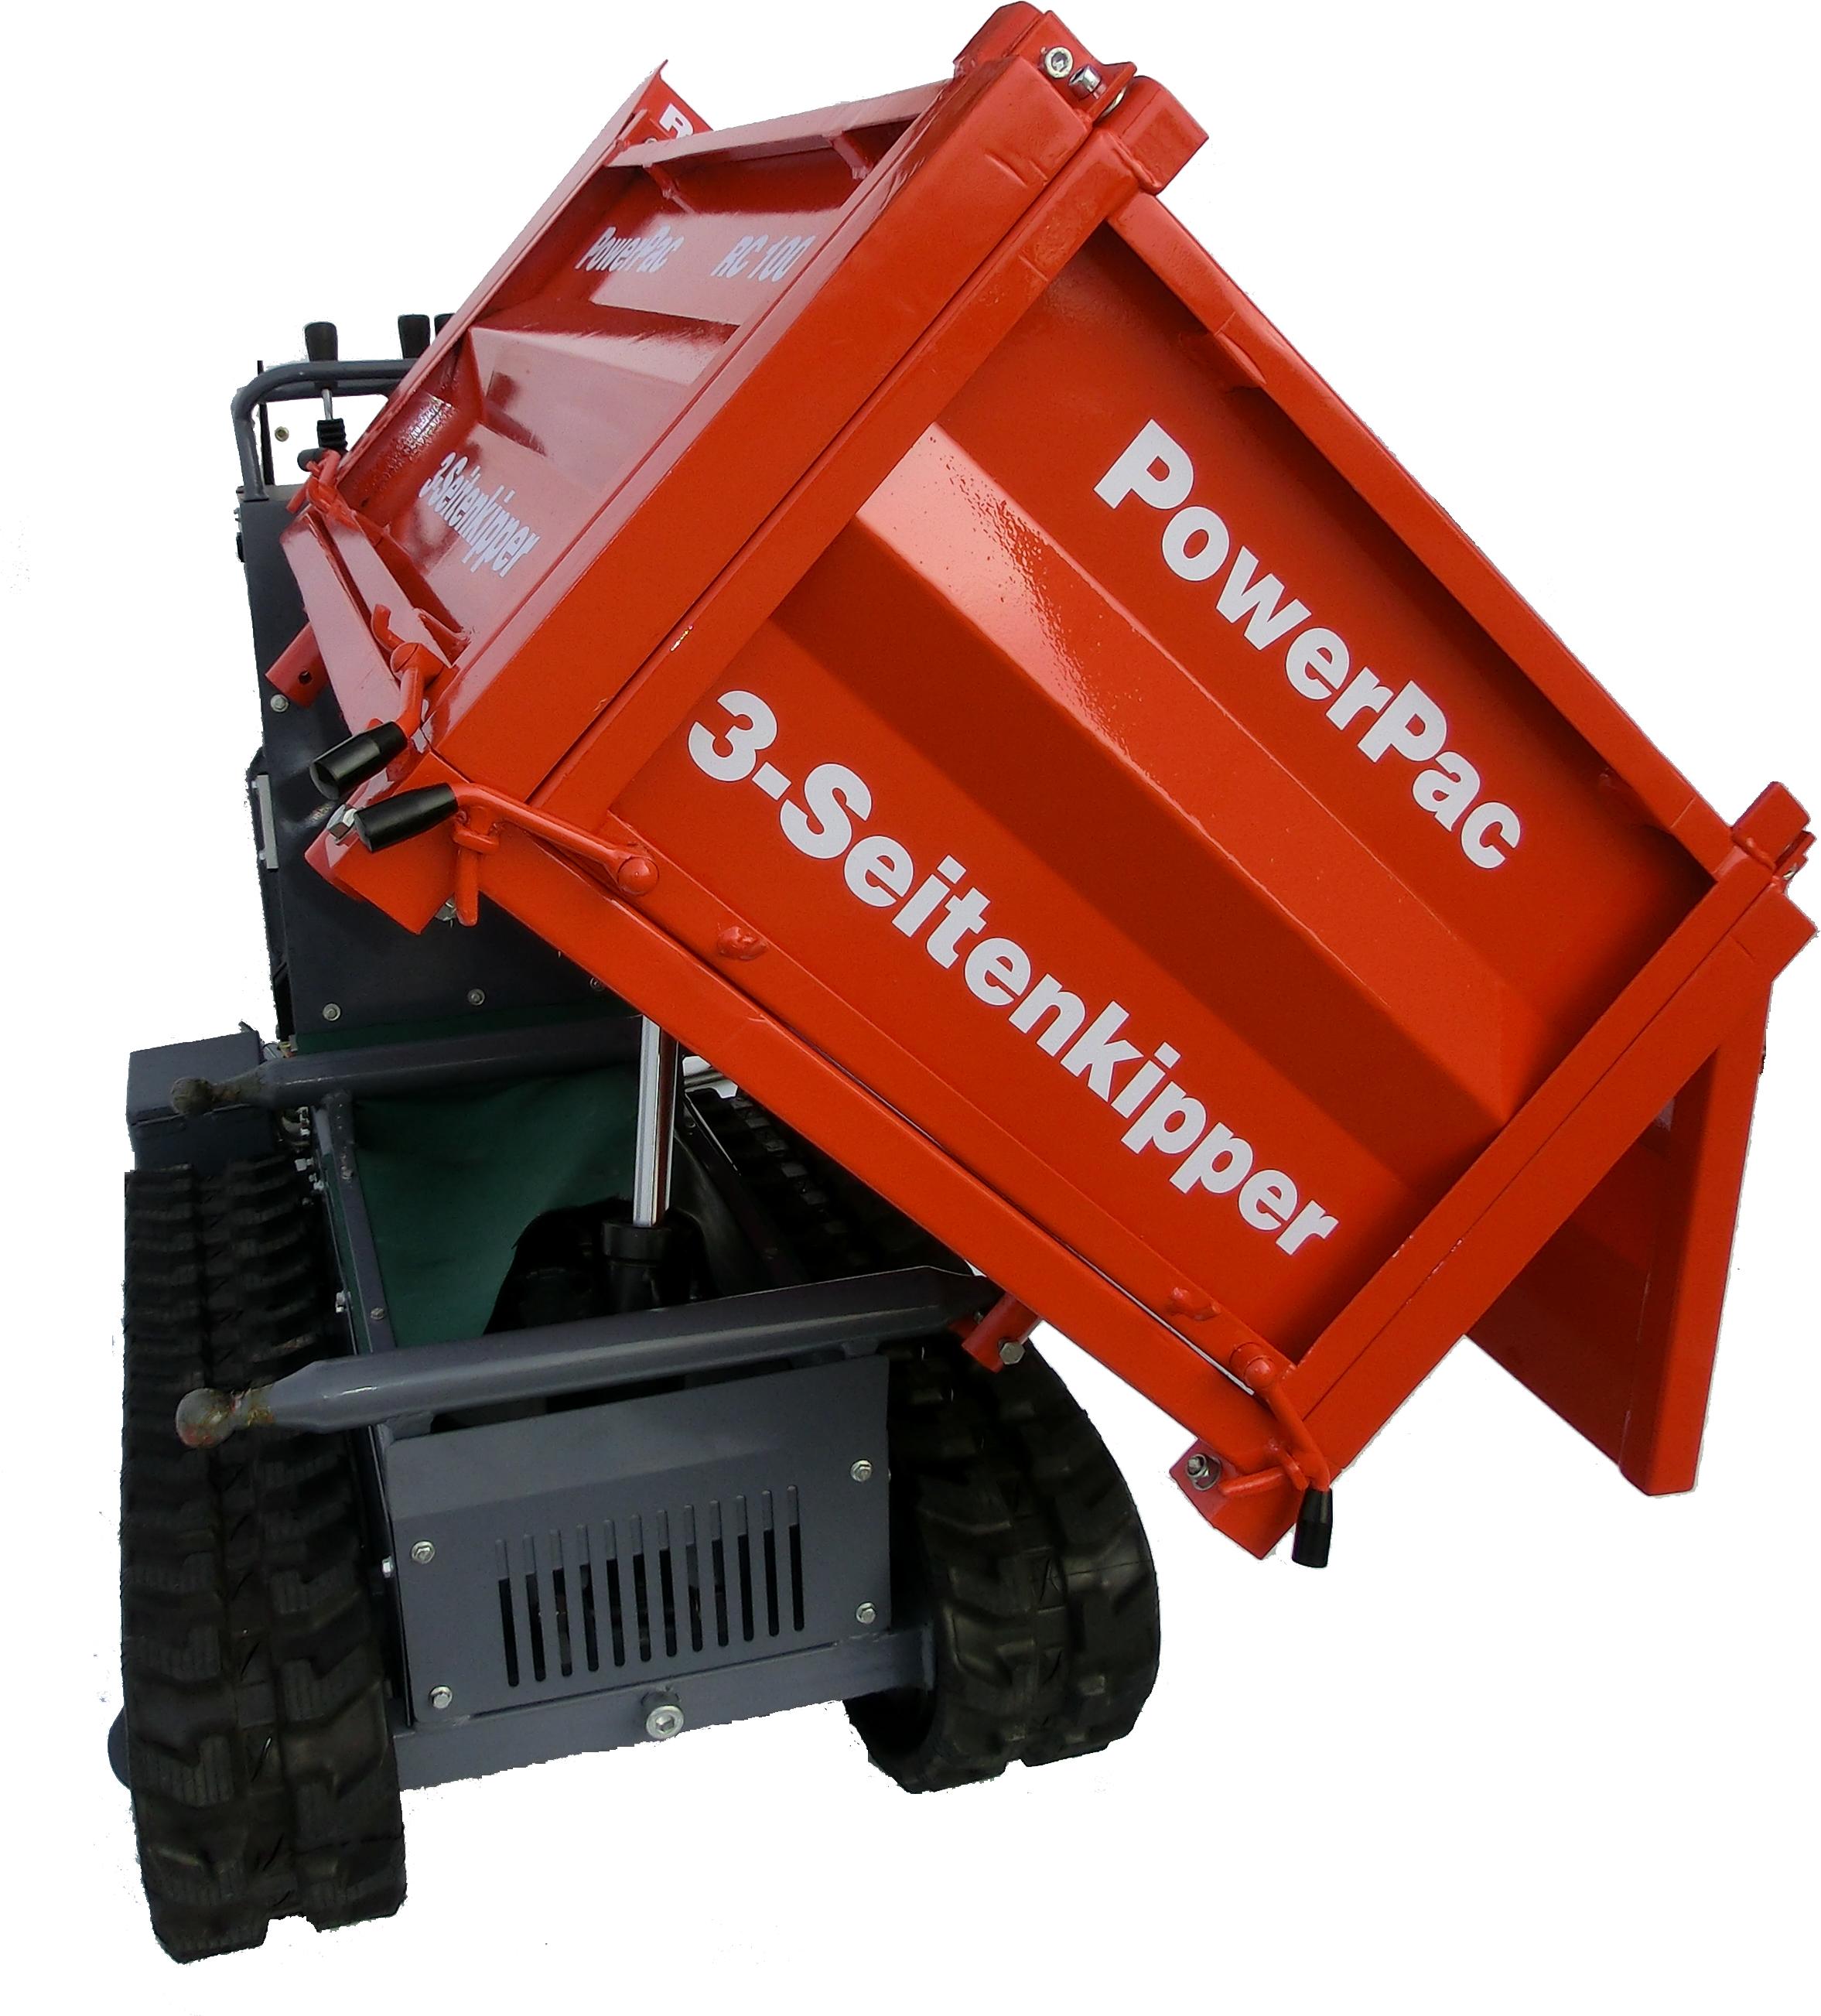 RC1000_track_dumper_pmi_Equipment